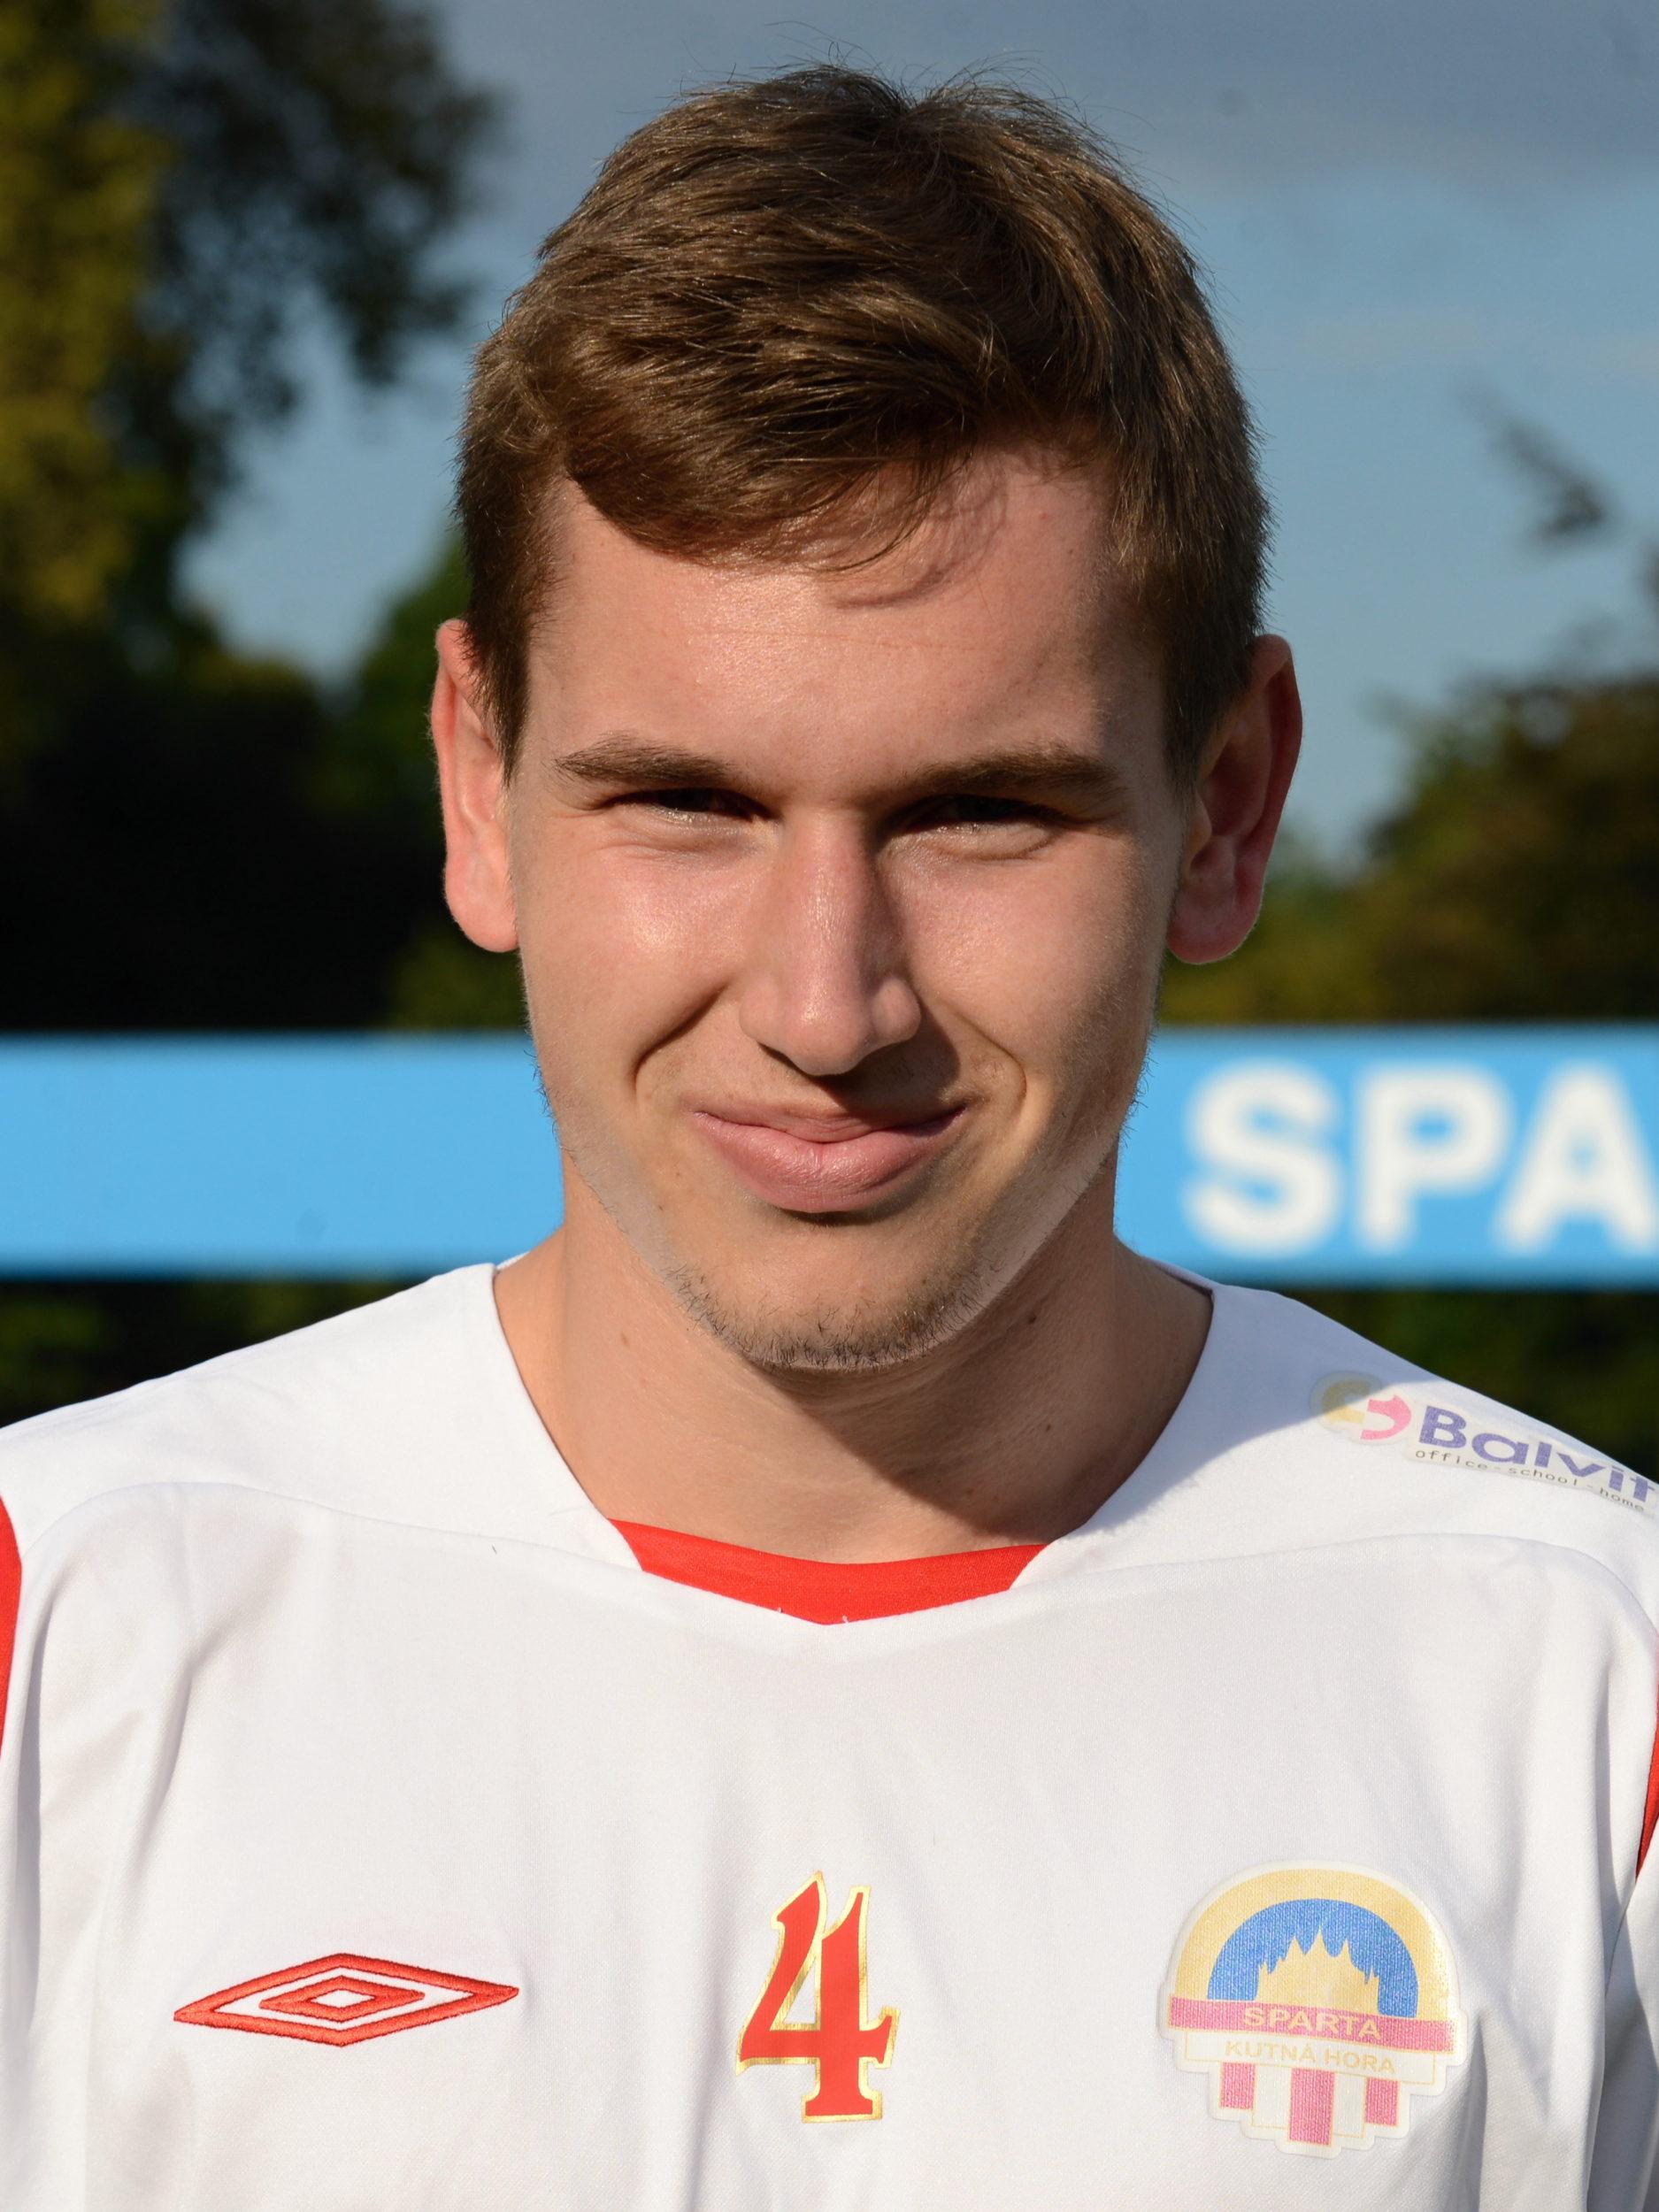 Petr Saulich